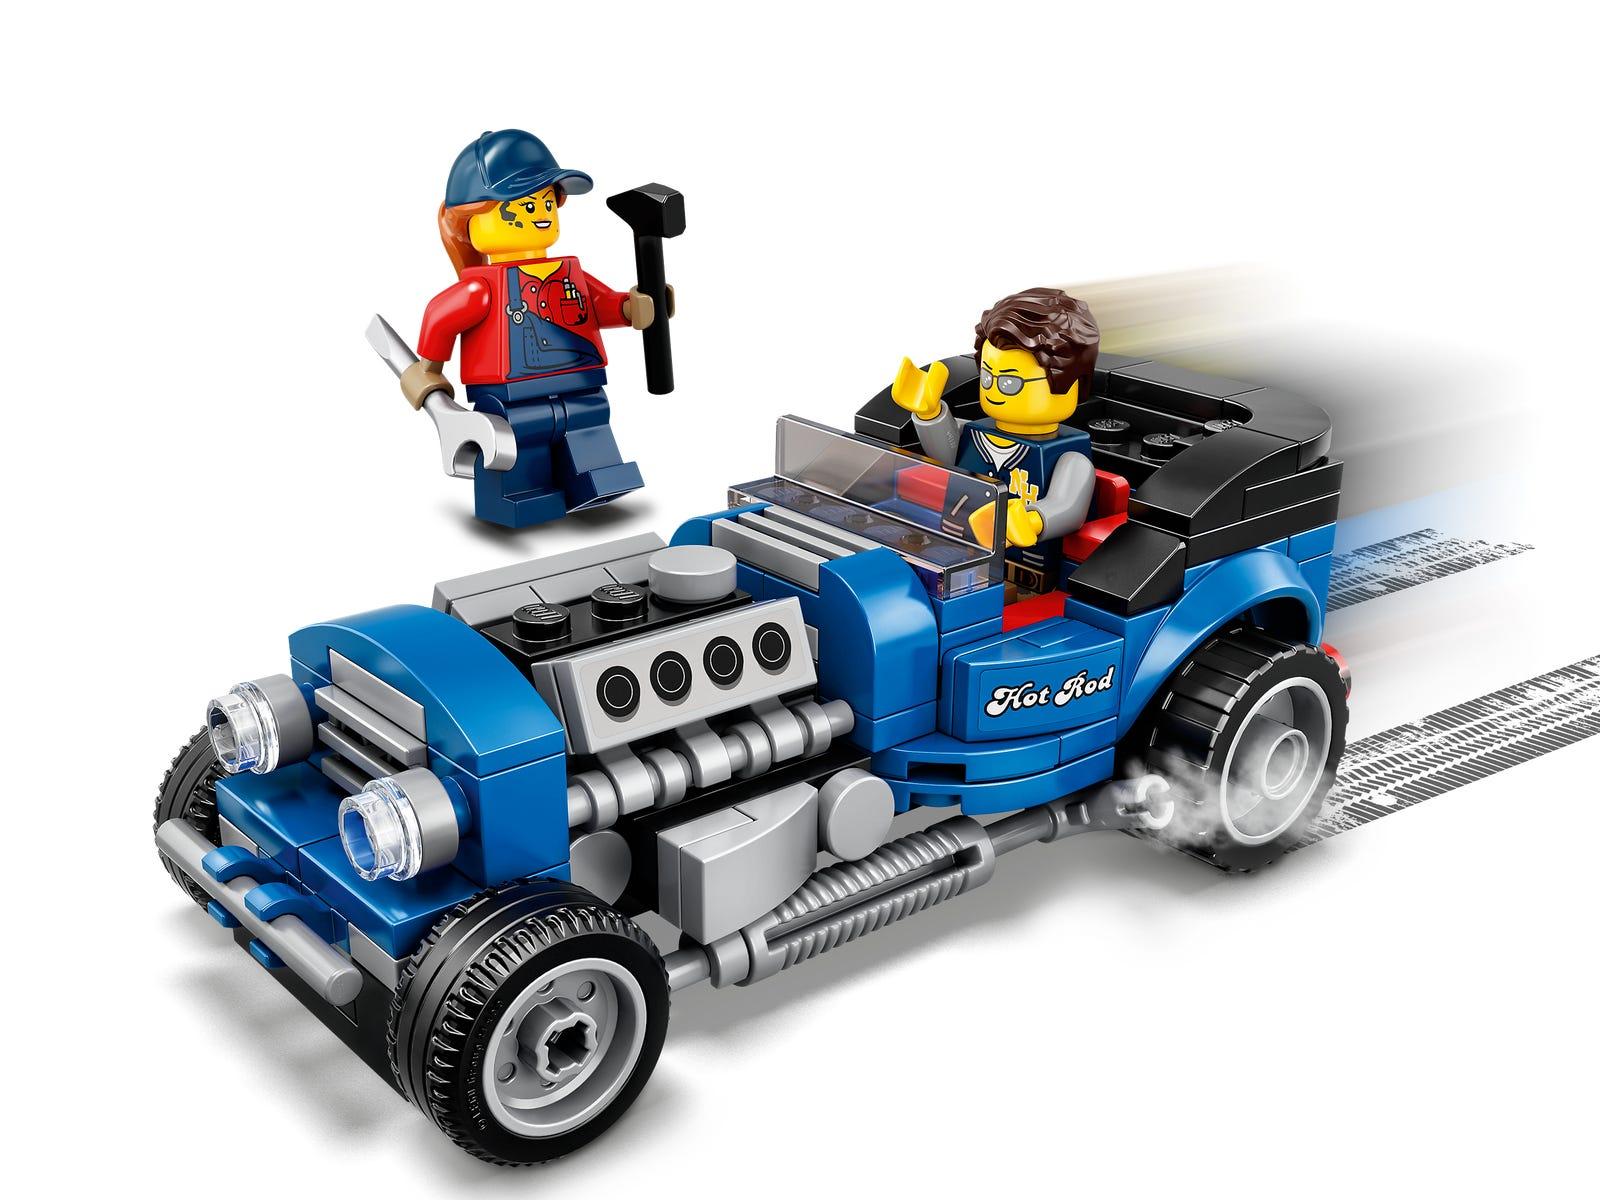 40409-box-hot-rod-lego-inhalt zusammengebaut.com